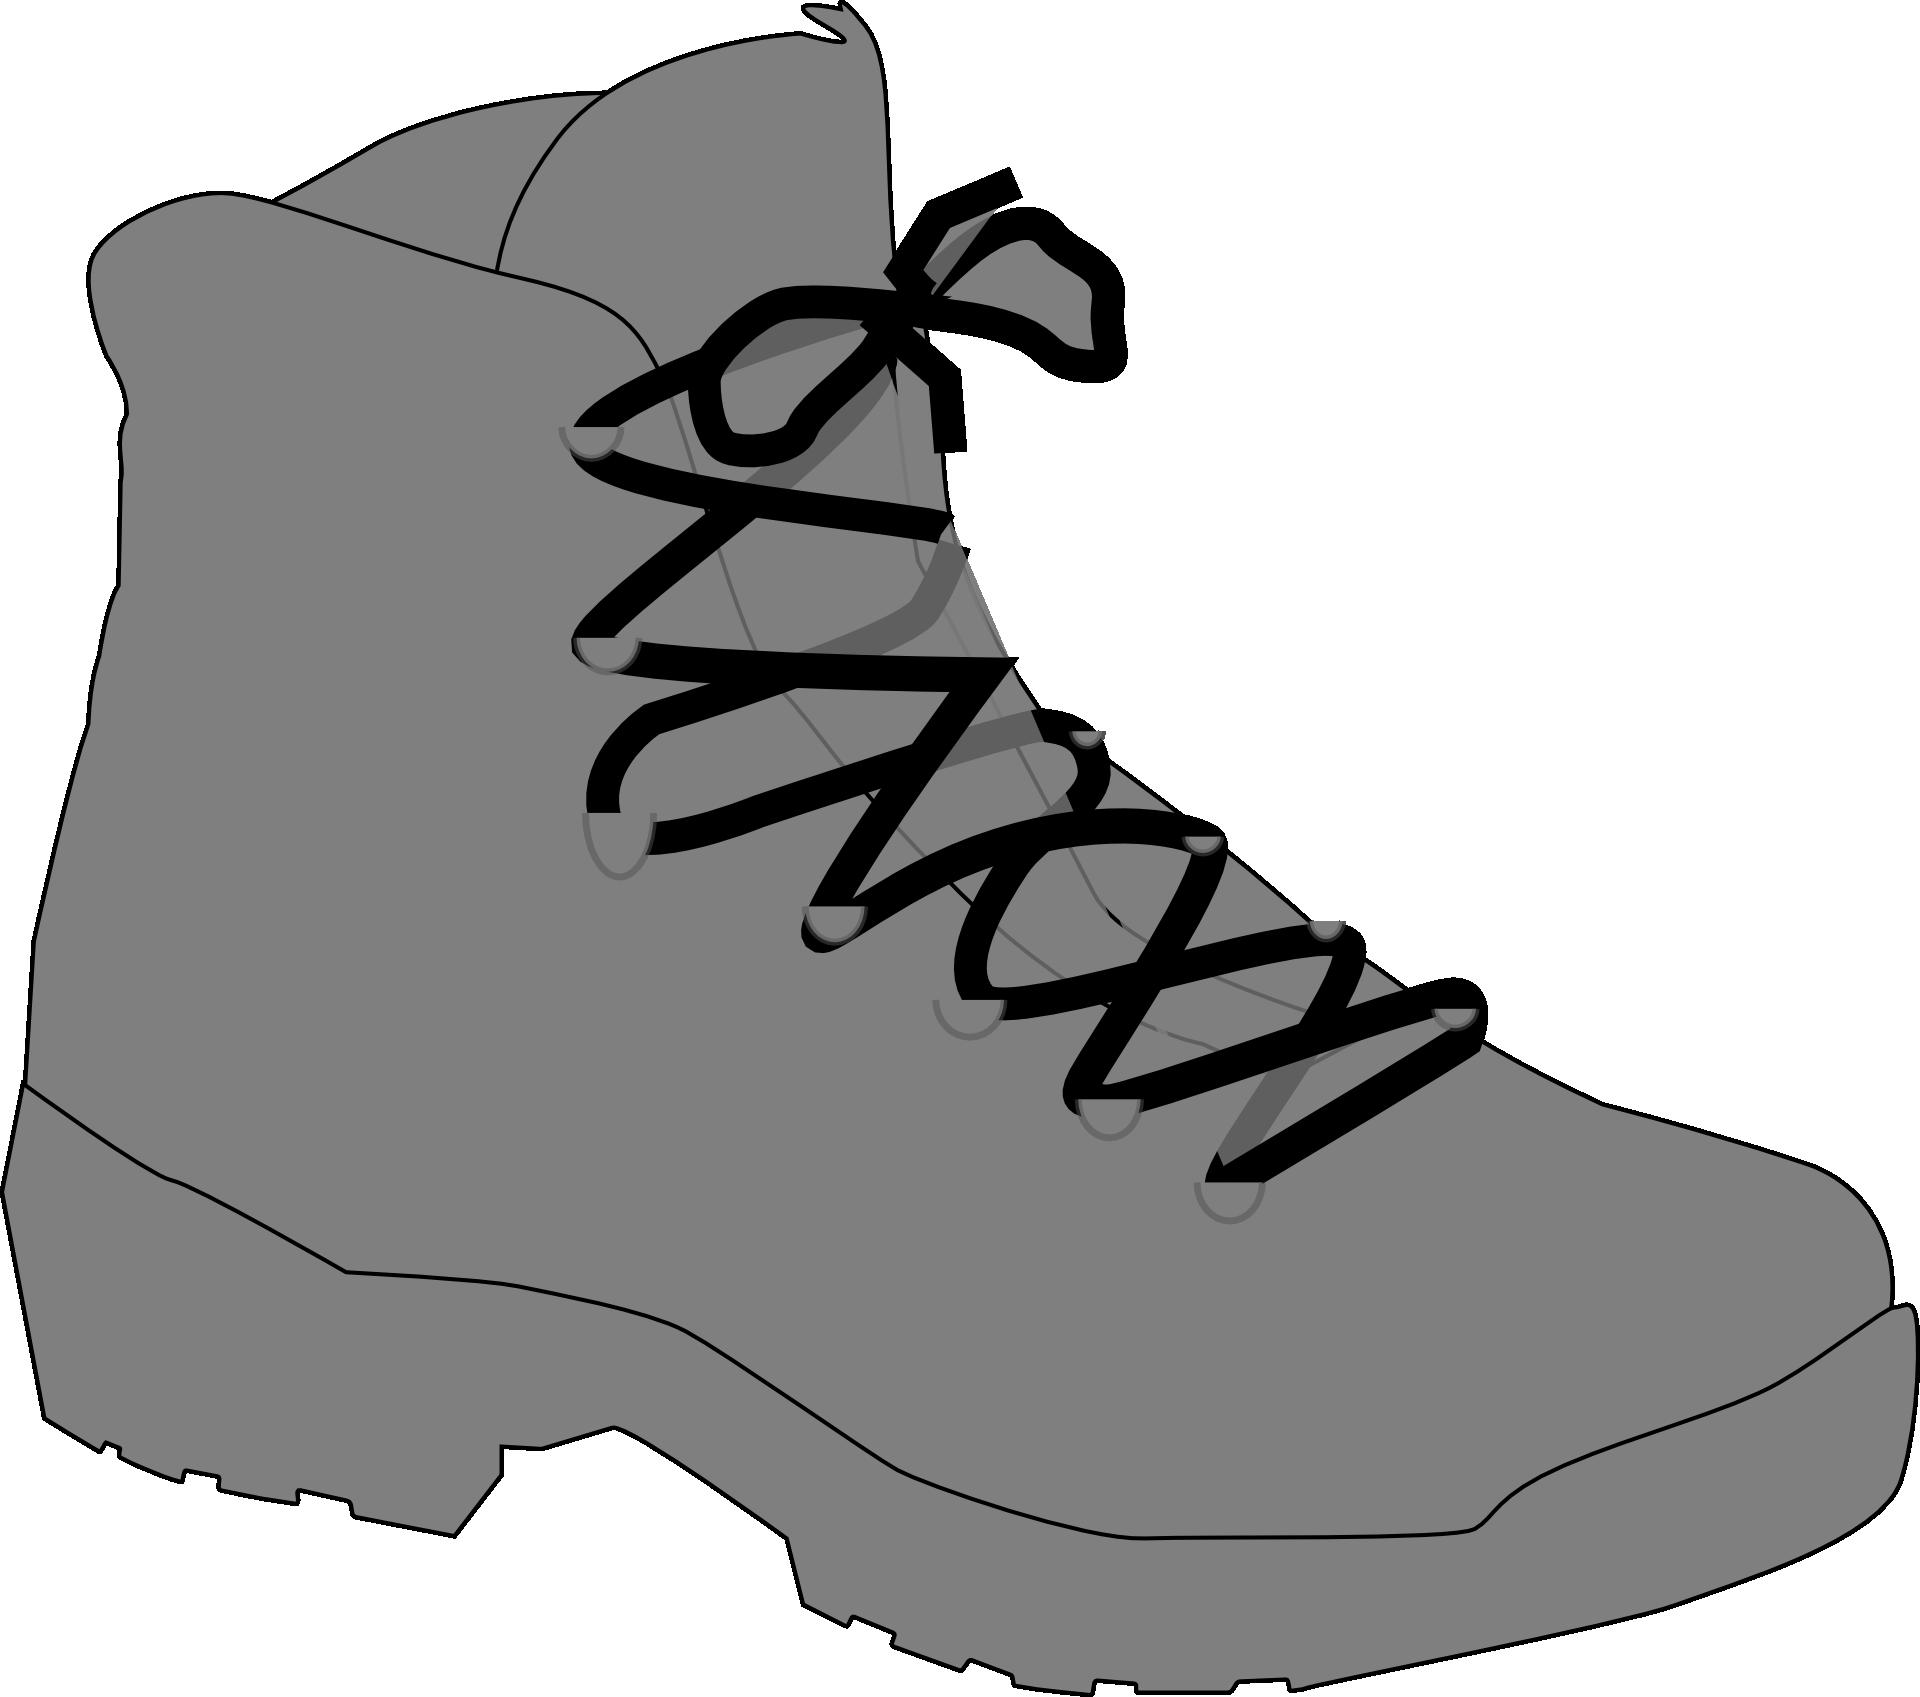 Hike clipart boot. Hiking clip art puss